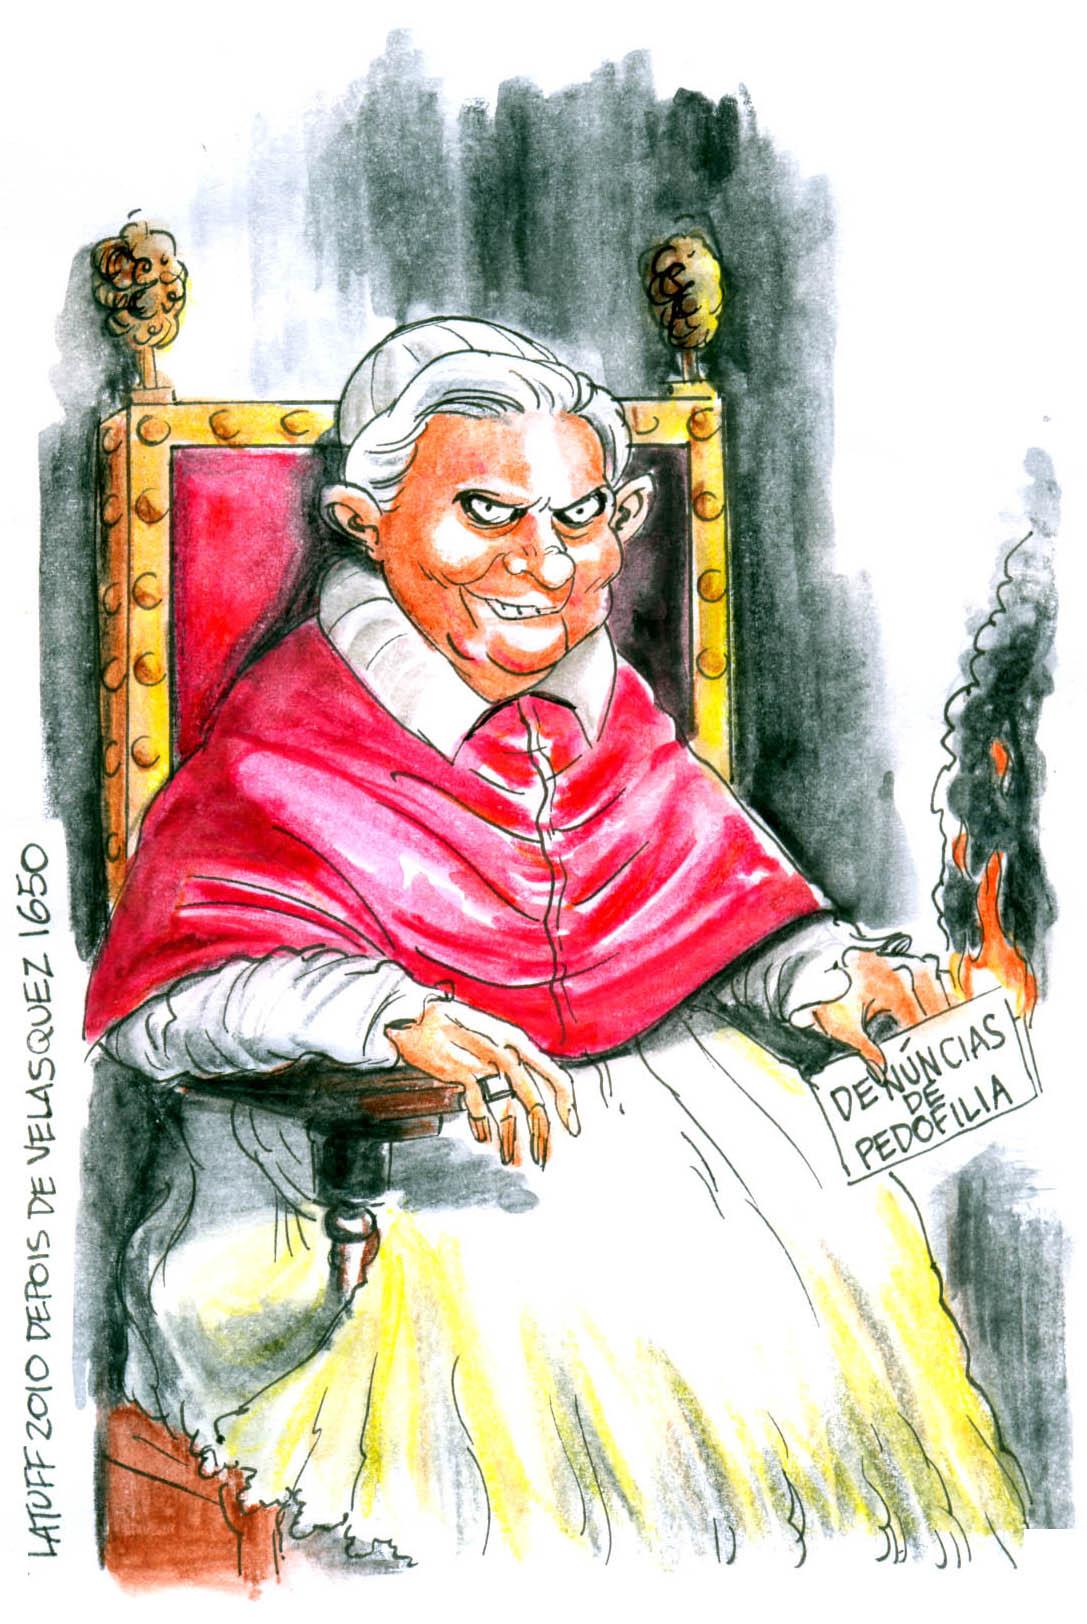 Pope Benedict XVI portrait by Latuff2